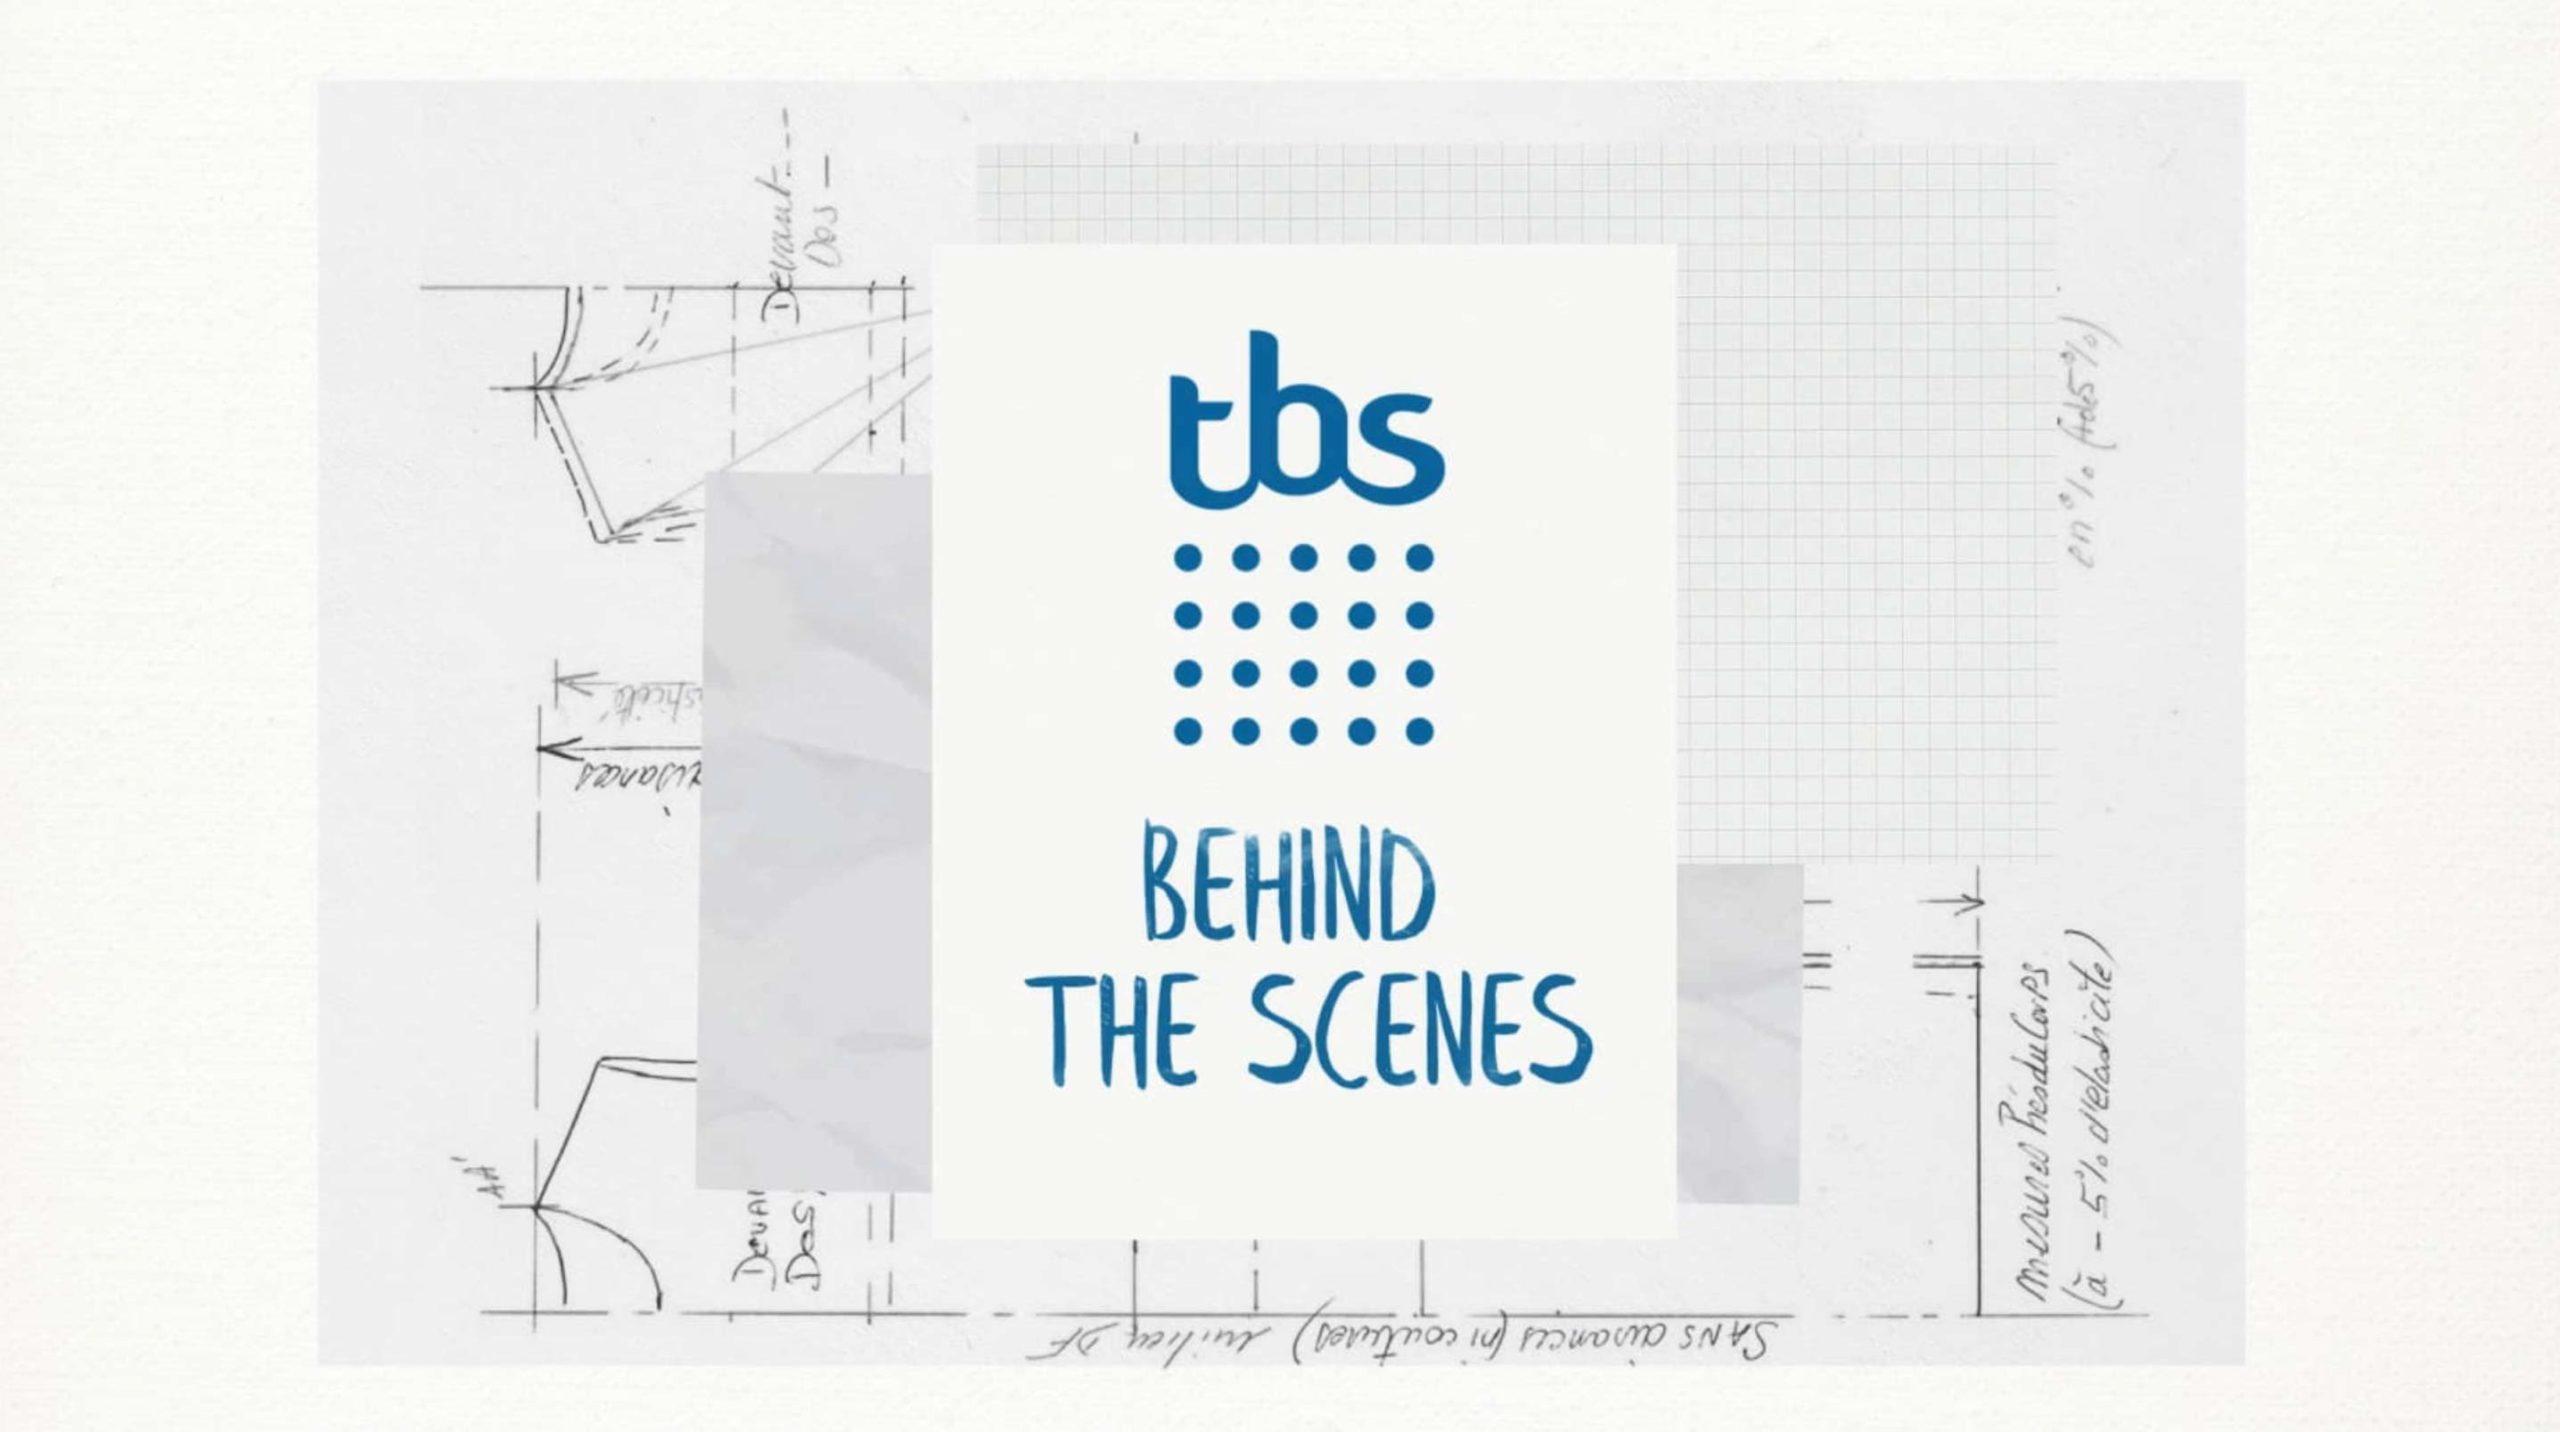 Behind_the_scenes_TBS